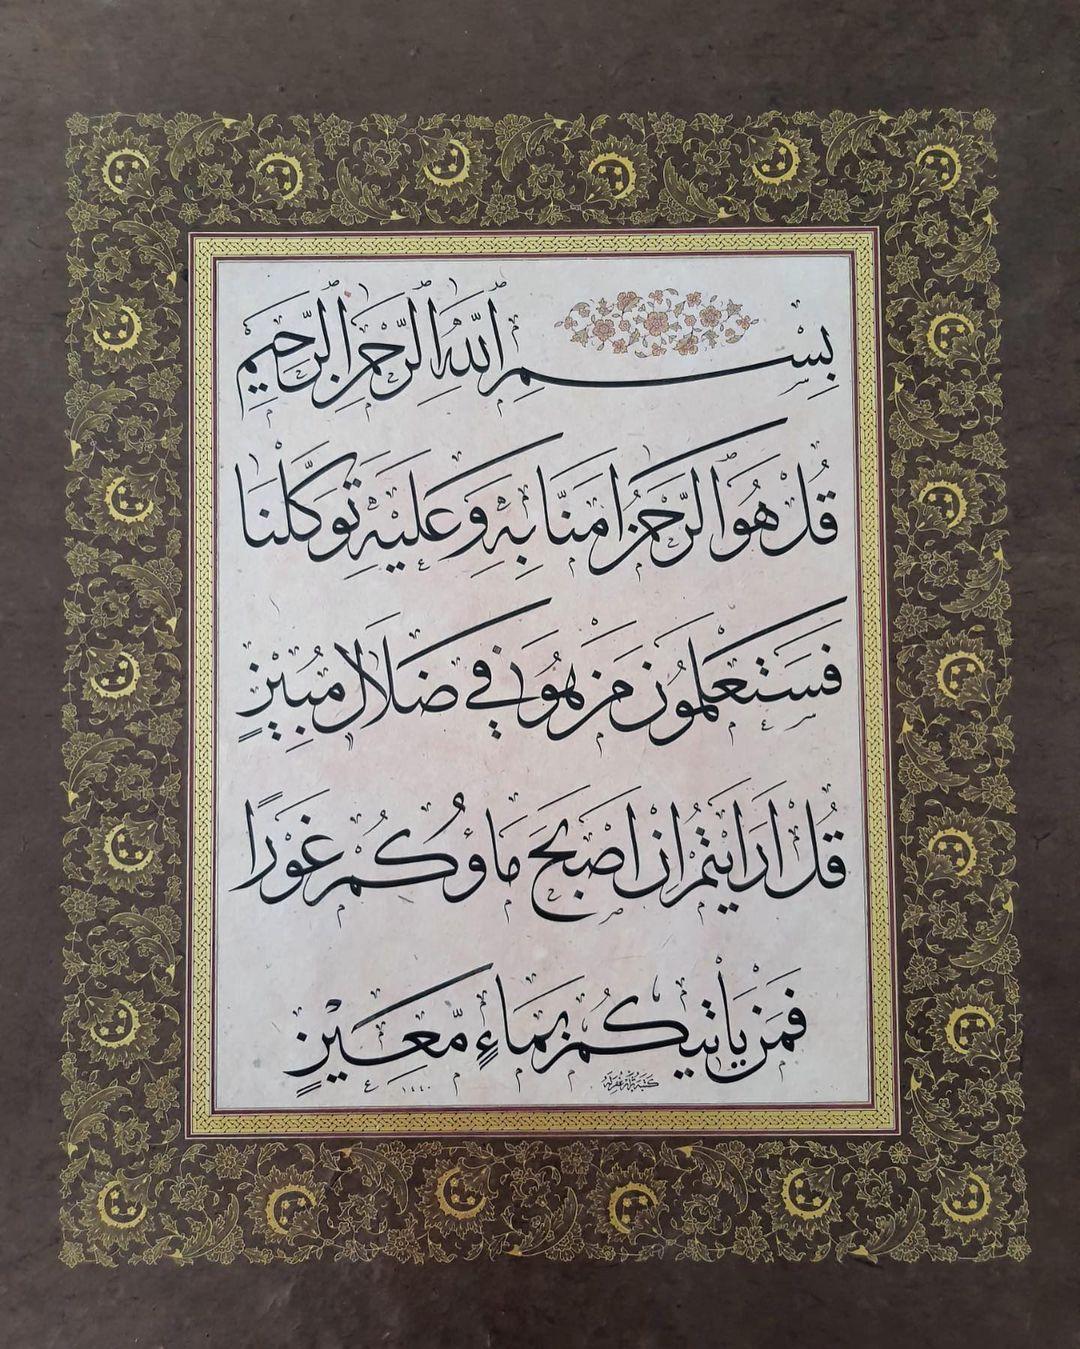 Professional Calligrapher Bijar Arbilly Calligraphy  القران الكريم..من تذهيب السيده گل جريك #calligraphy #kunst #art #tehran #istanbu… 387